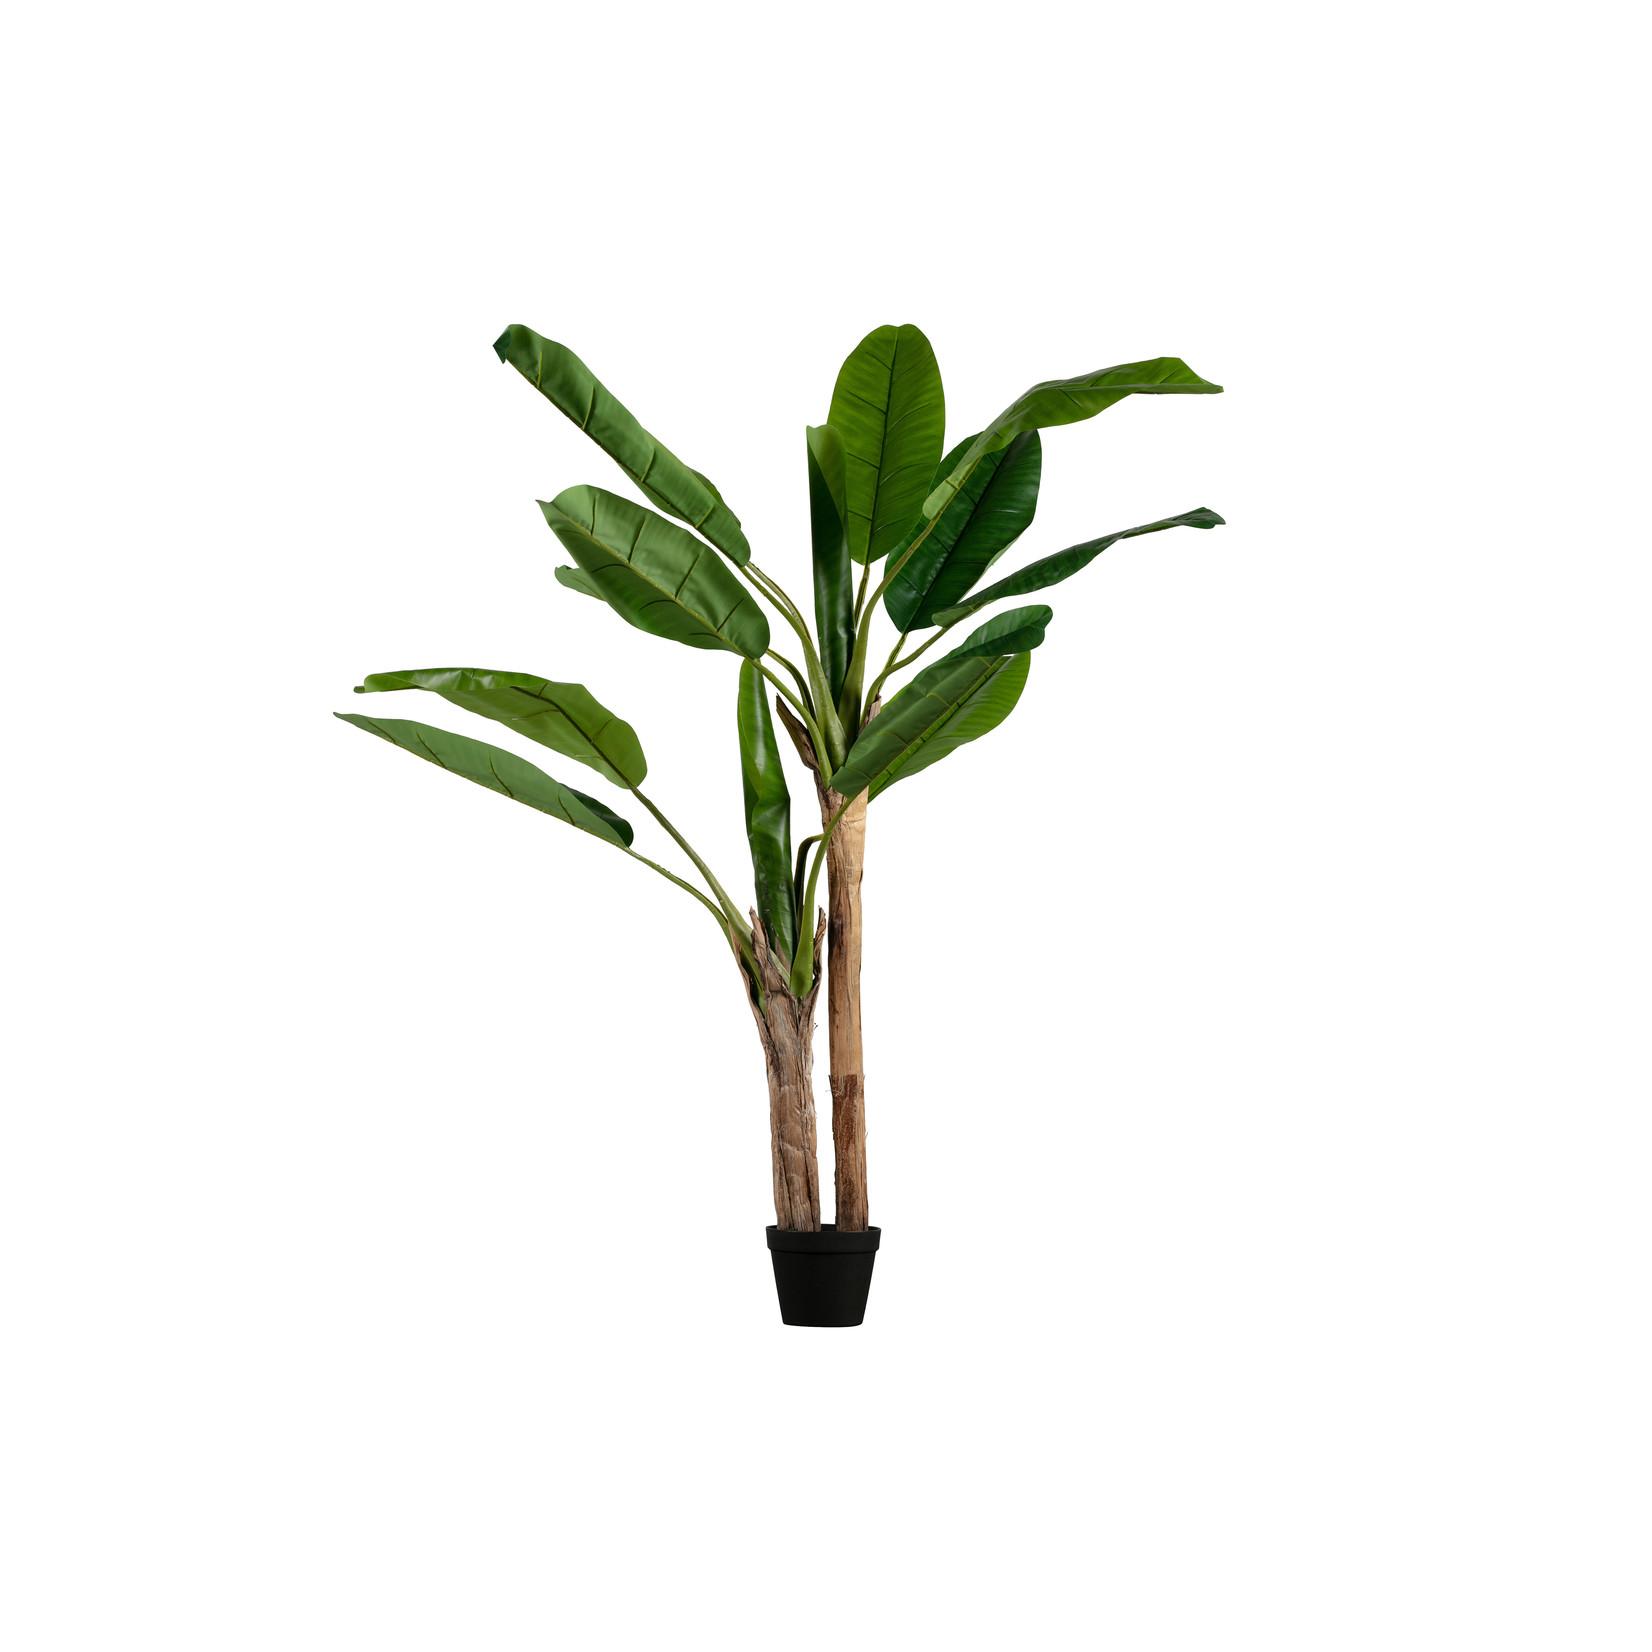 Woood Bananenplant Kunstplant Groen 138cm